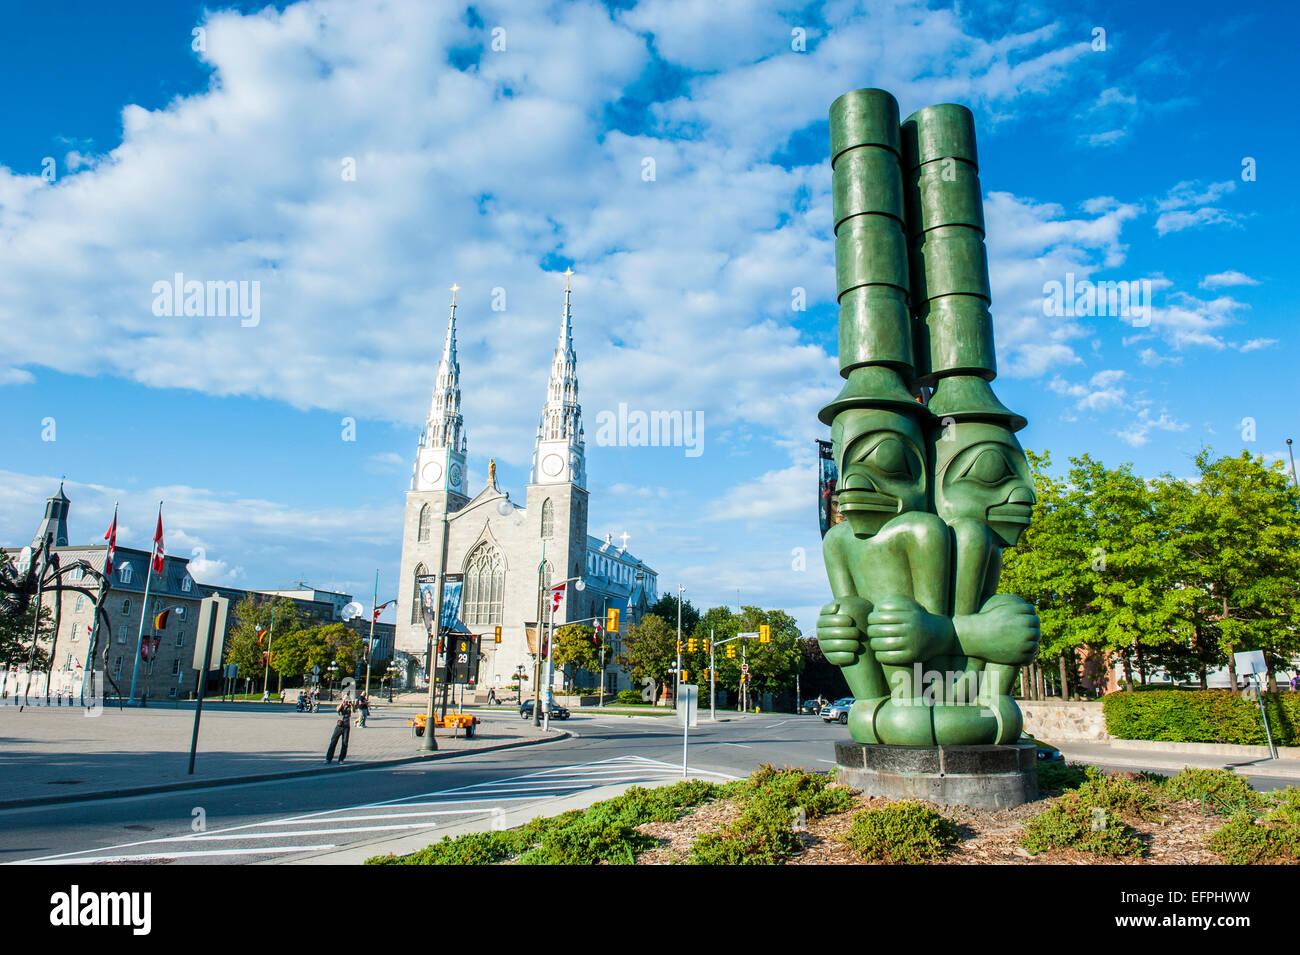 Moderne Statue, Ottawa, Ontario, Kanada, Nordamerika Stockbild